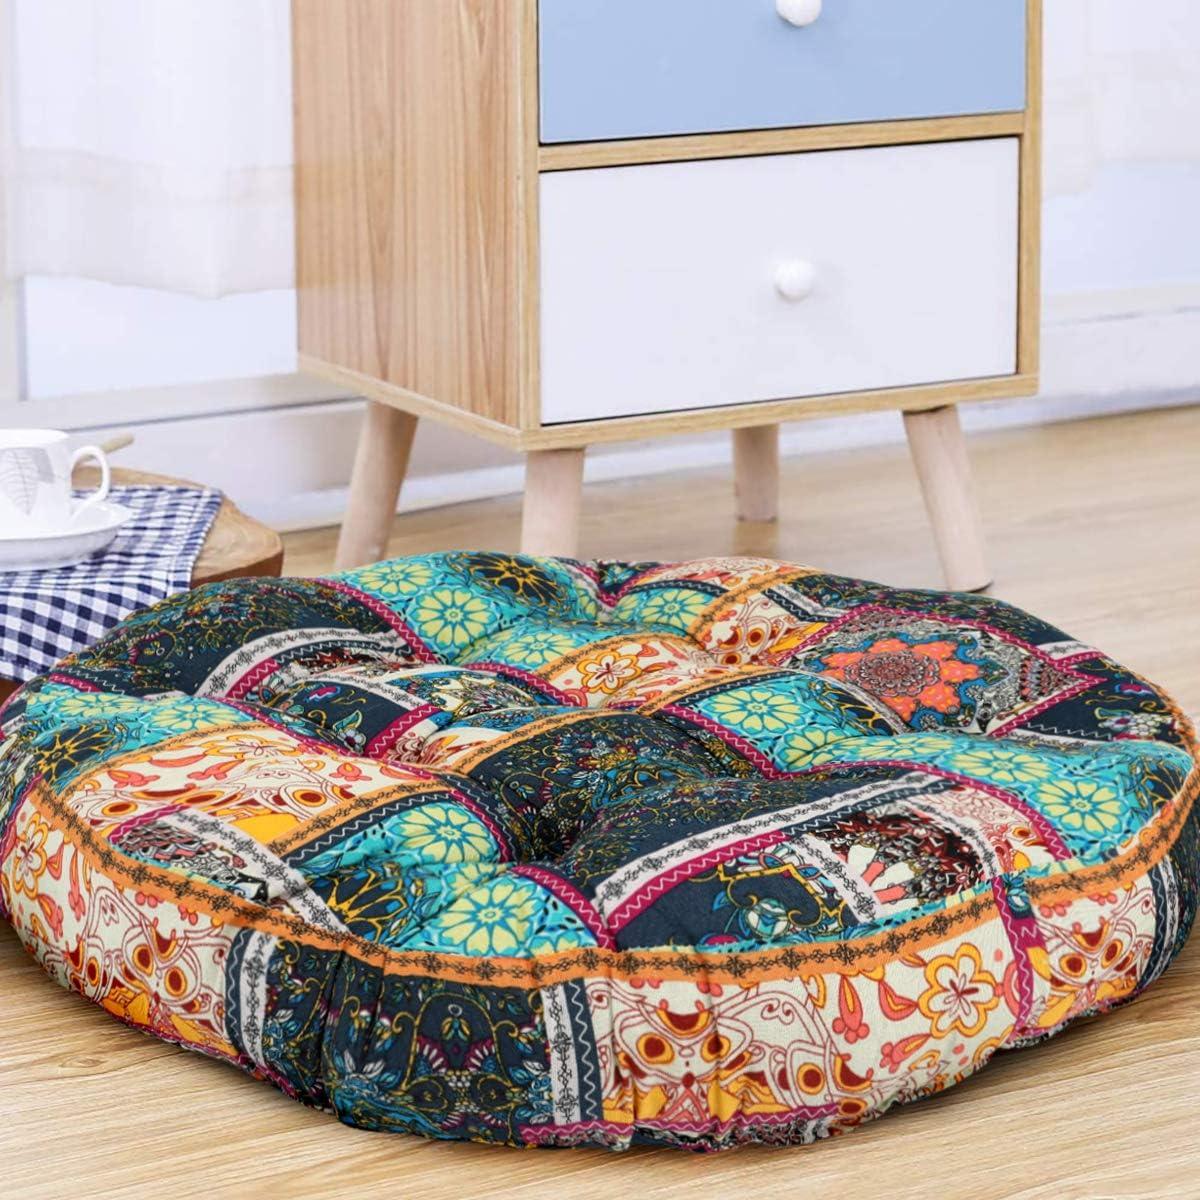 Superlatite Bohemian Thicken Futon Seating Floor Mat Cushion Cove Yoga Superior